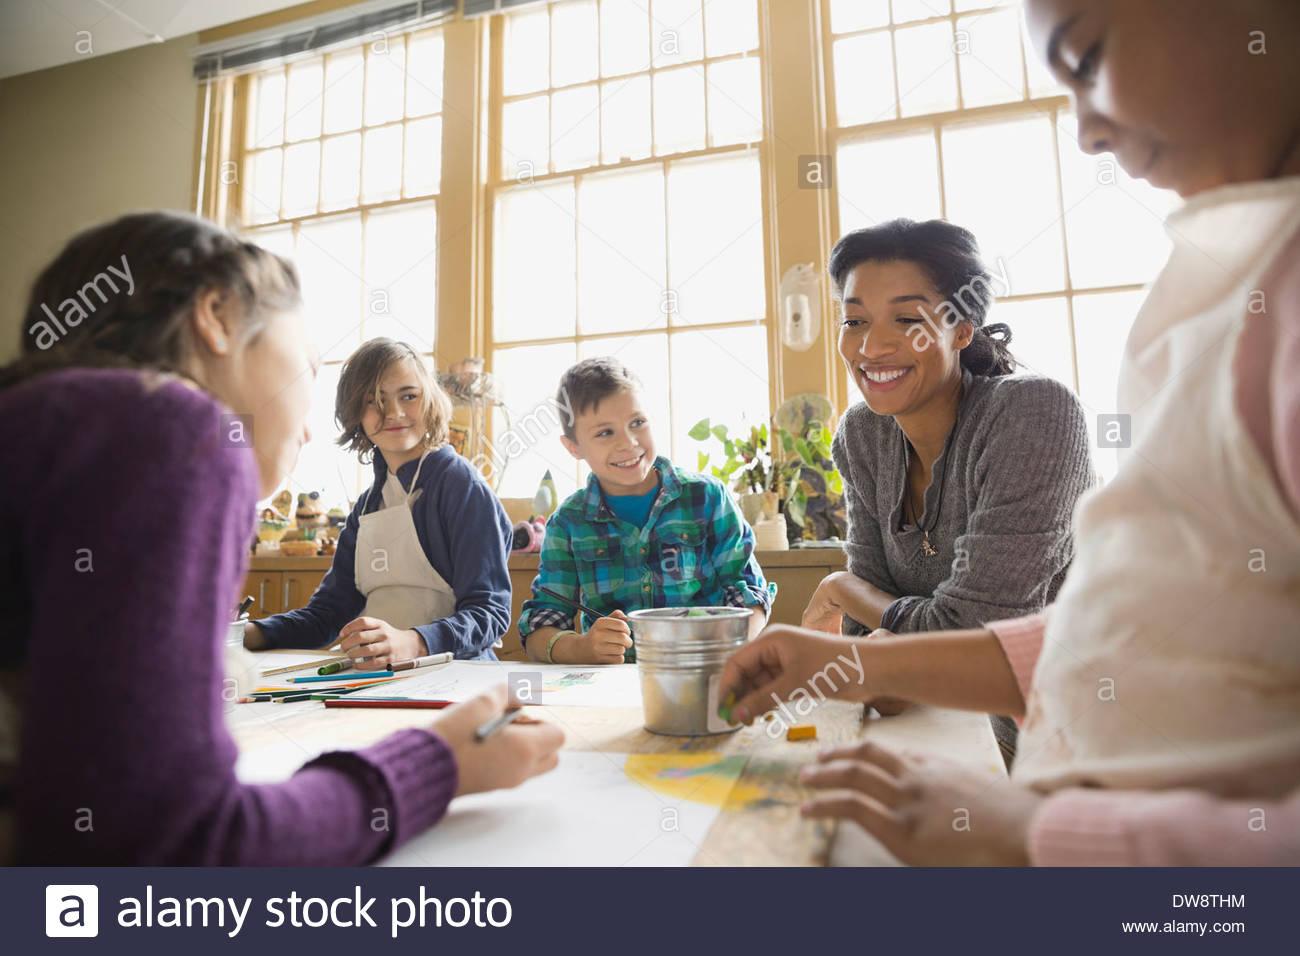 Teacher watching students in art class Stock Photo